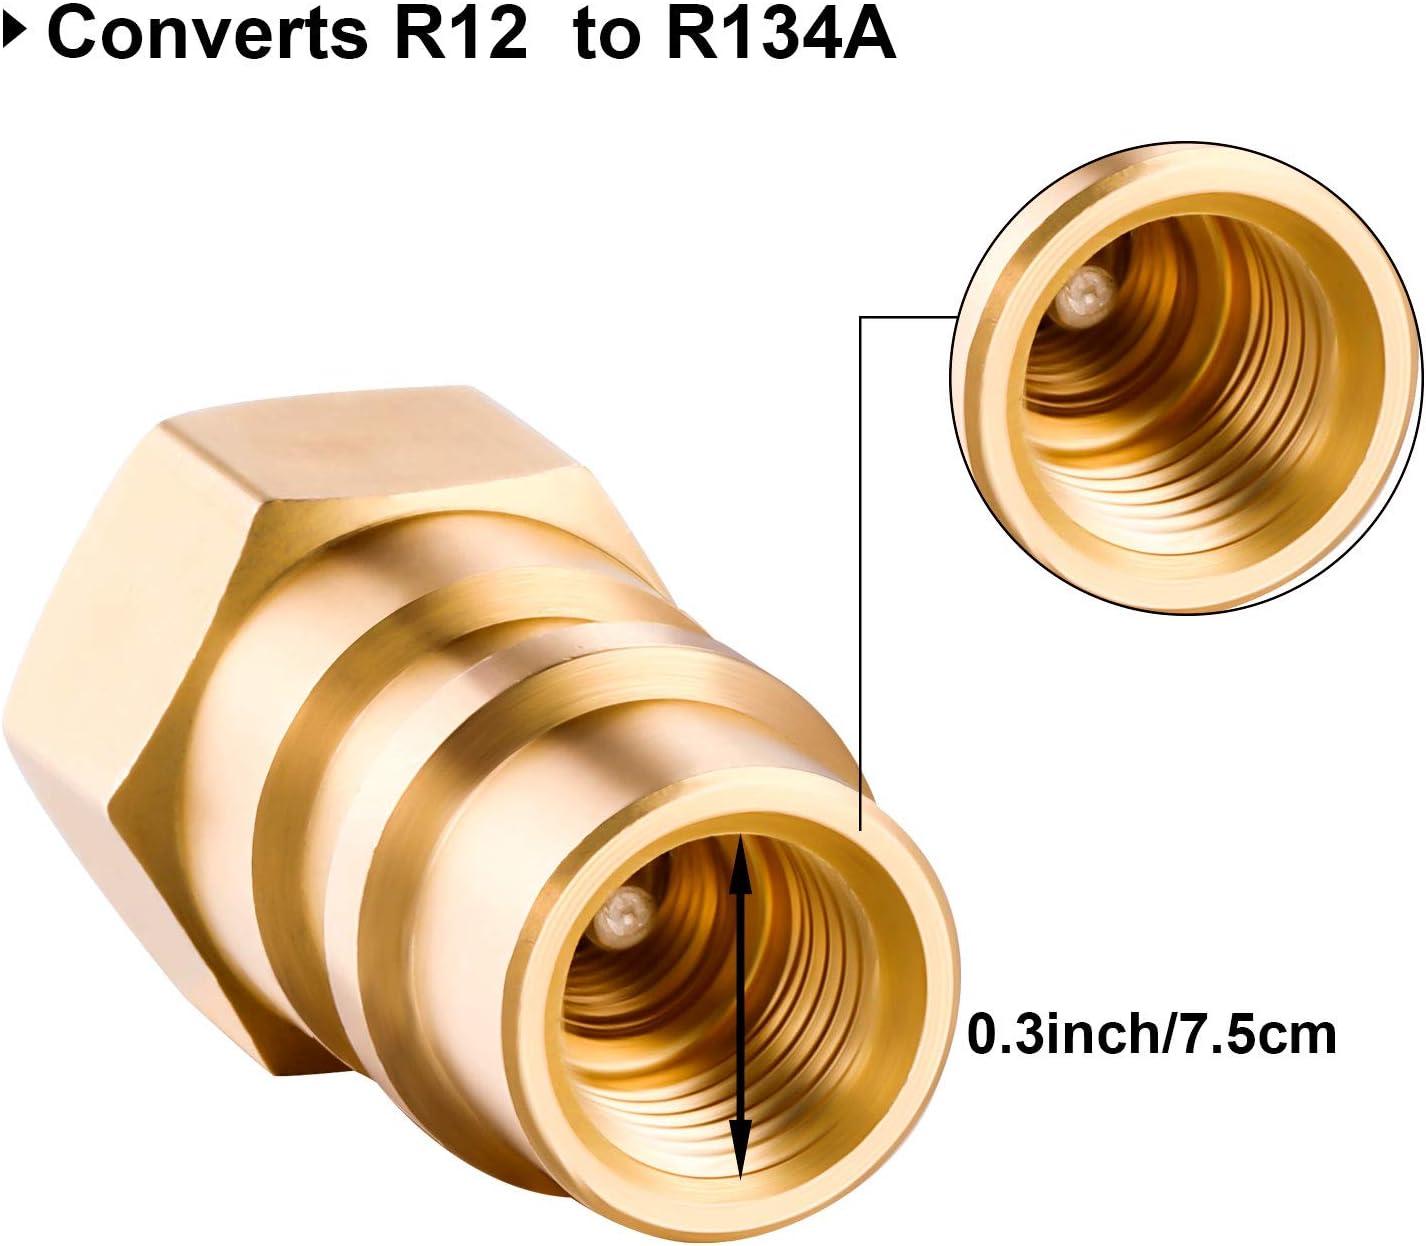 Mudder 4 Pieces VA-LH11 A//C Pro R-12 to R-134a Retrofit Parts Kit Retrofit Conversion Adapter Fitting 1//4 SAE Thread Low High Side Retrofit Conversion